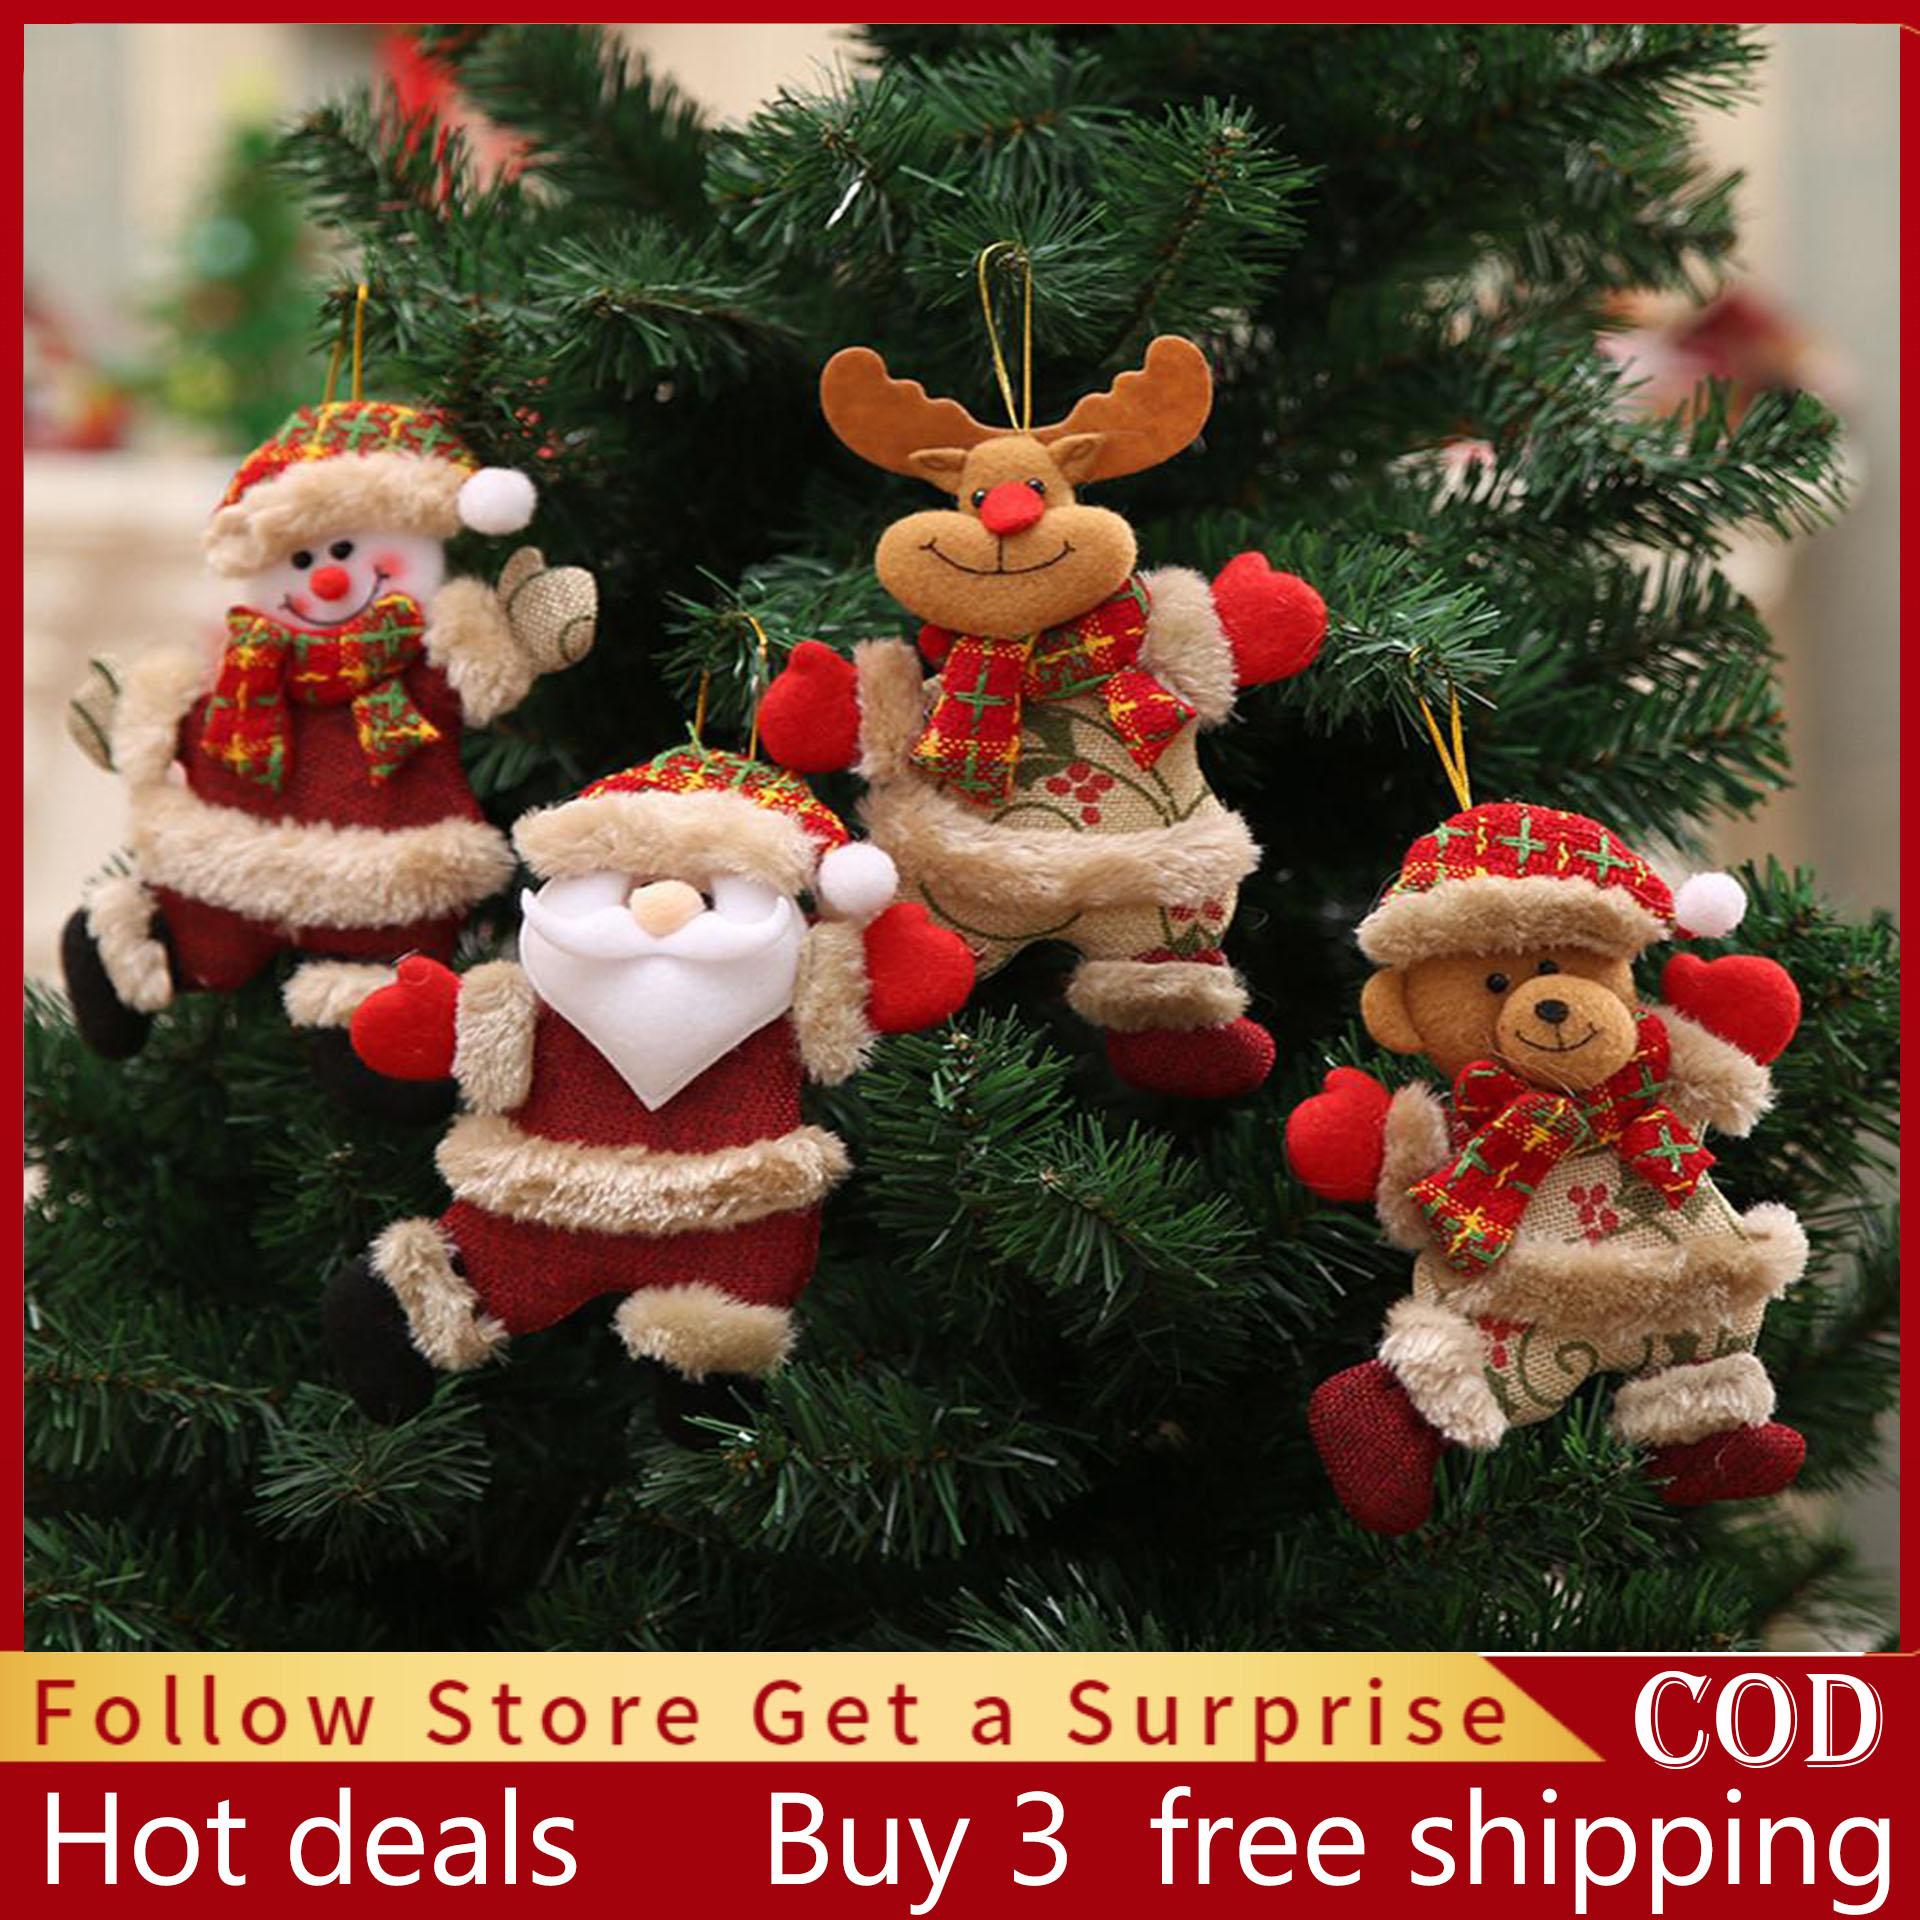 Cod 4pcs Christmas Ornaments Gift Santa Claus Snowman Xmas Decoration Christmas Tree Ornaments Toy Doll Hang Christmas Decorations On Sale Lazada Ph